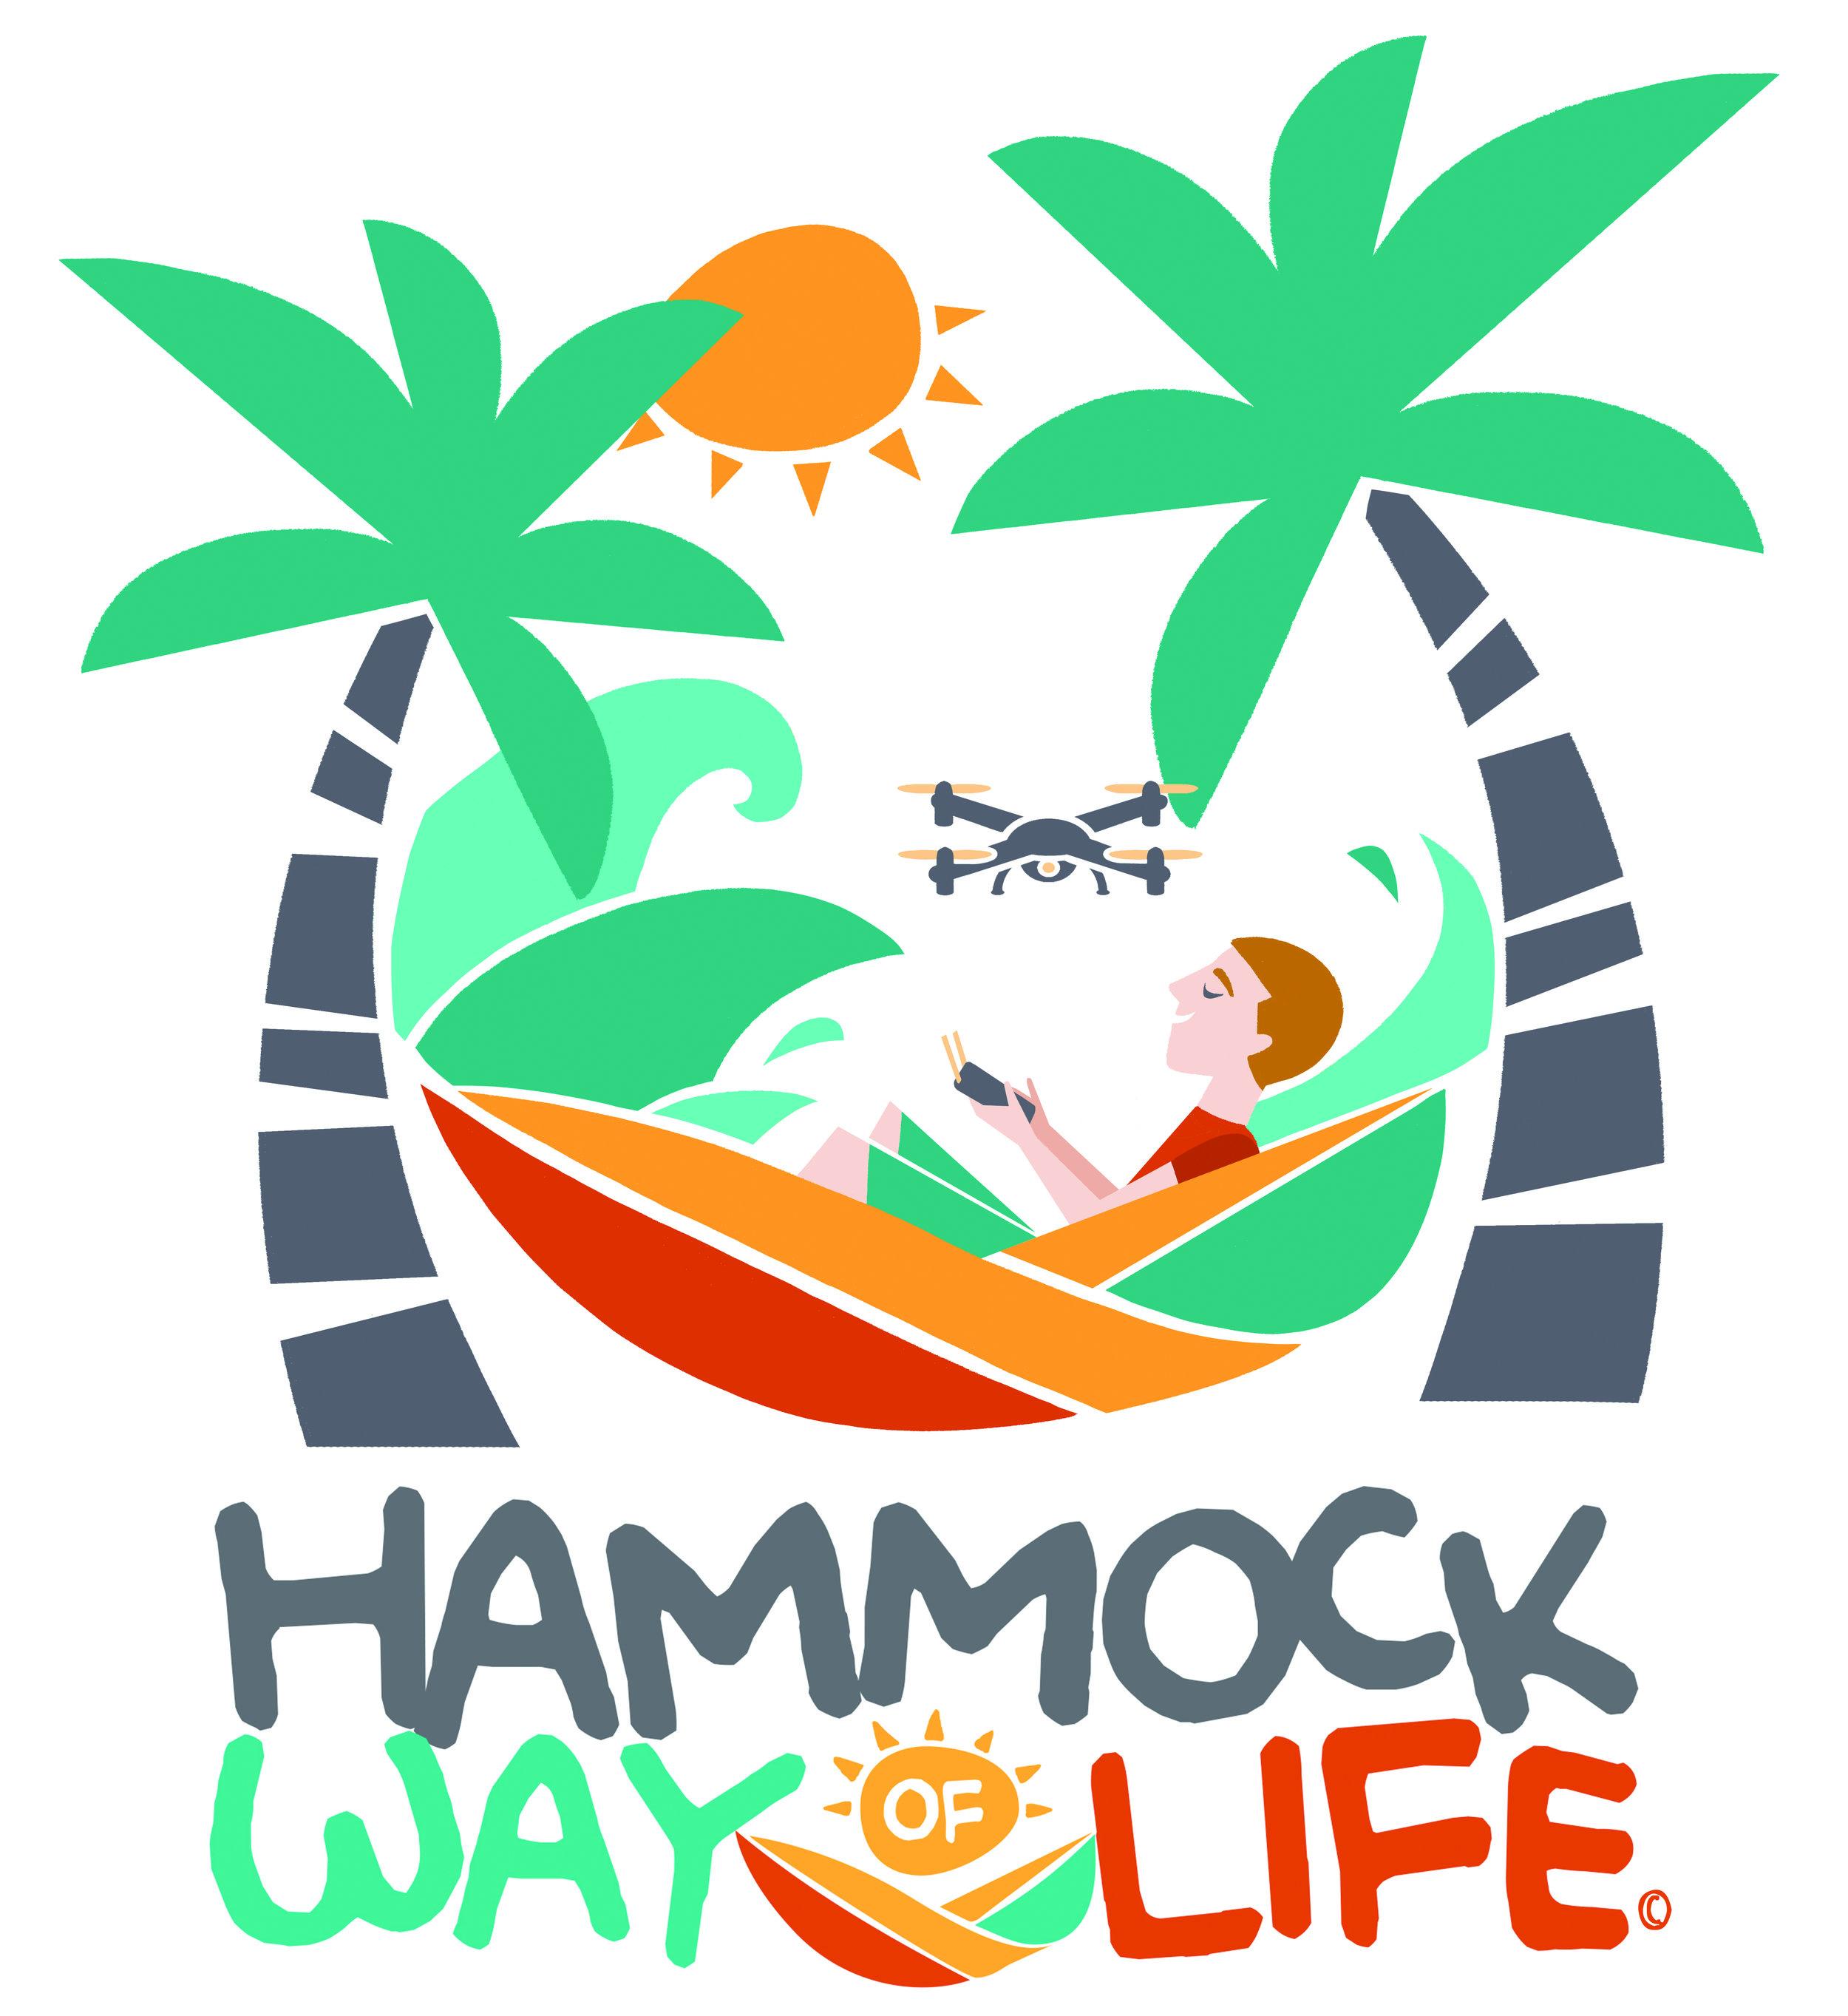 Droning in a Hammock